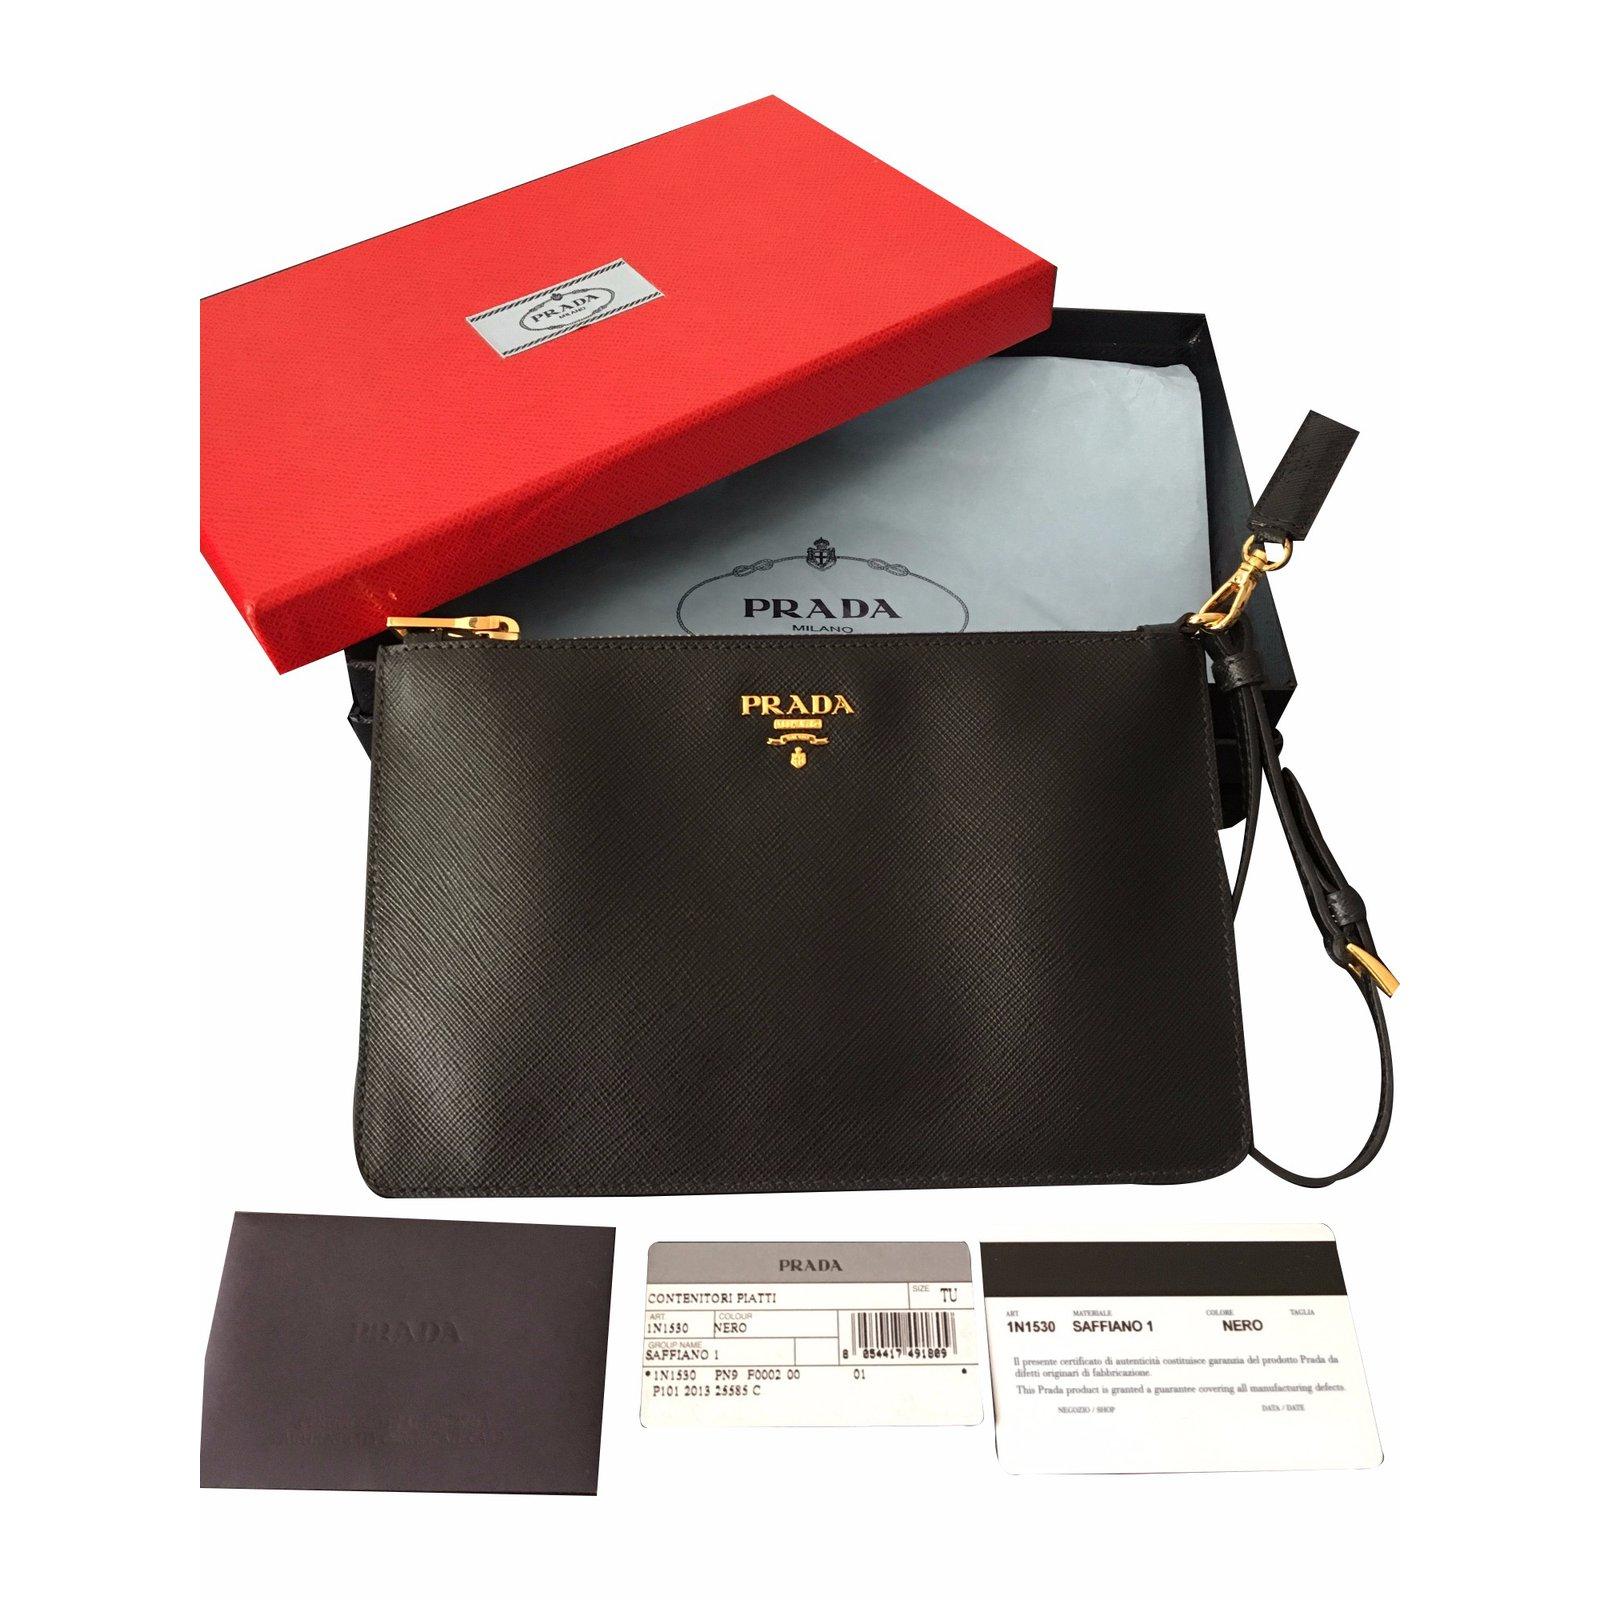 c799bc598d9d Prada Clutch Saffiano leather Clutch bags Leather Black ref.20834 ...